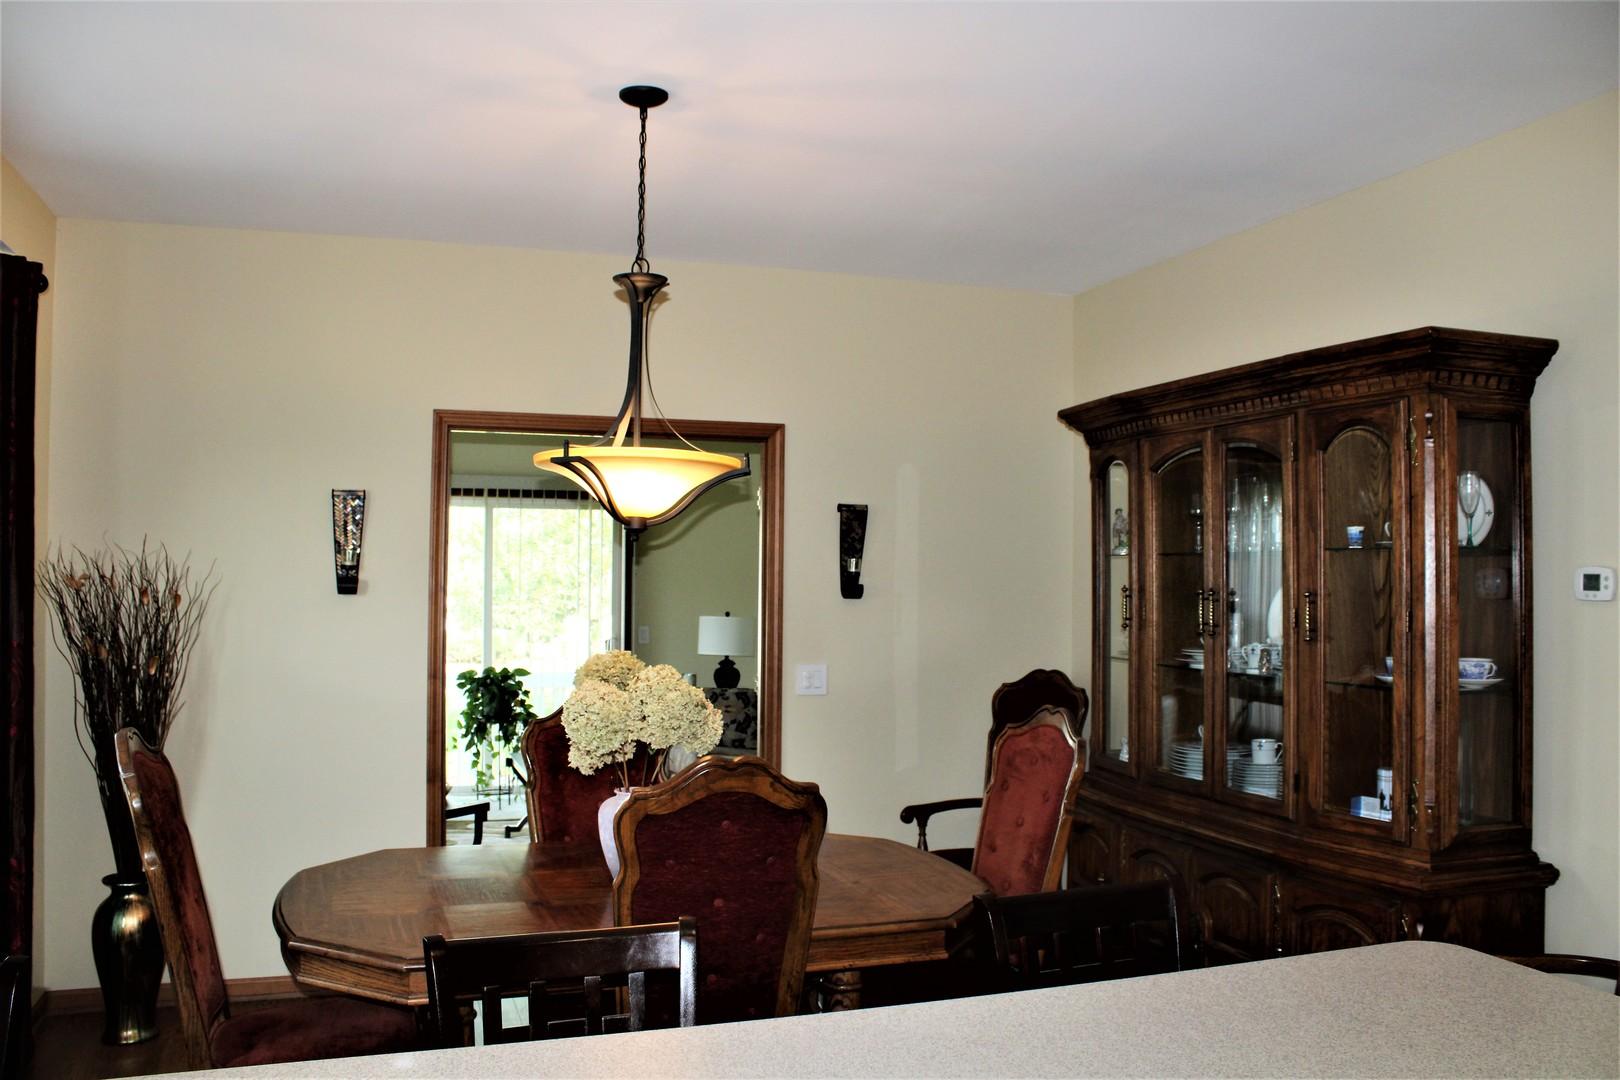 3230 Whirlaway, Grayslake, Illinois, 60030